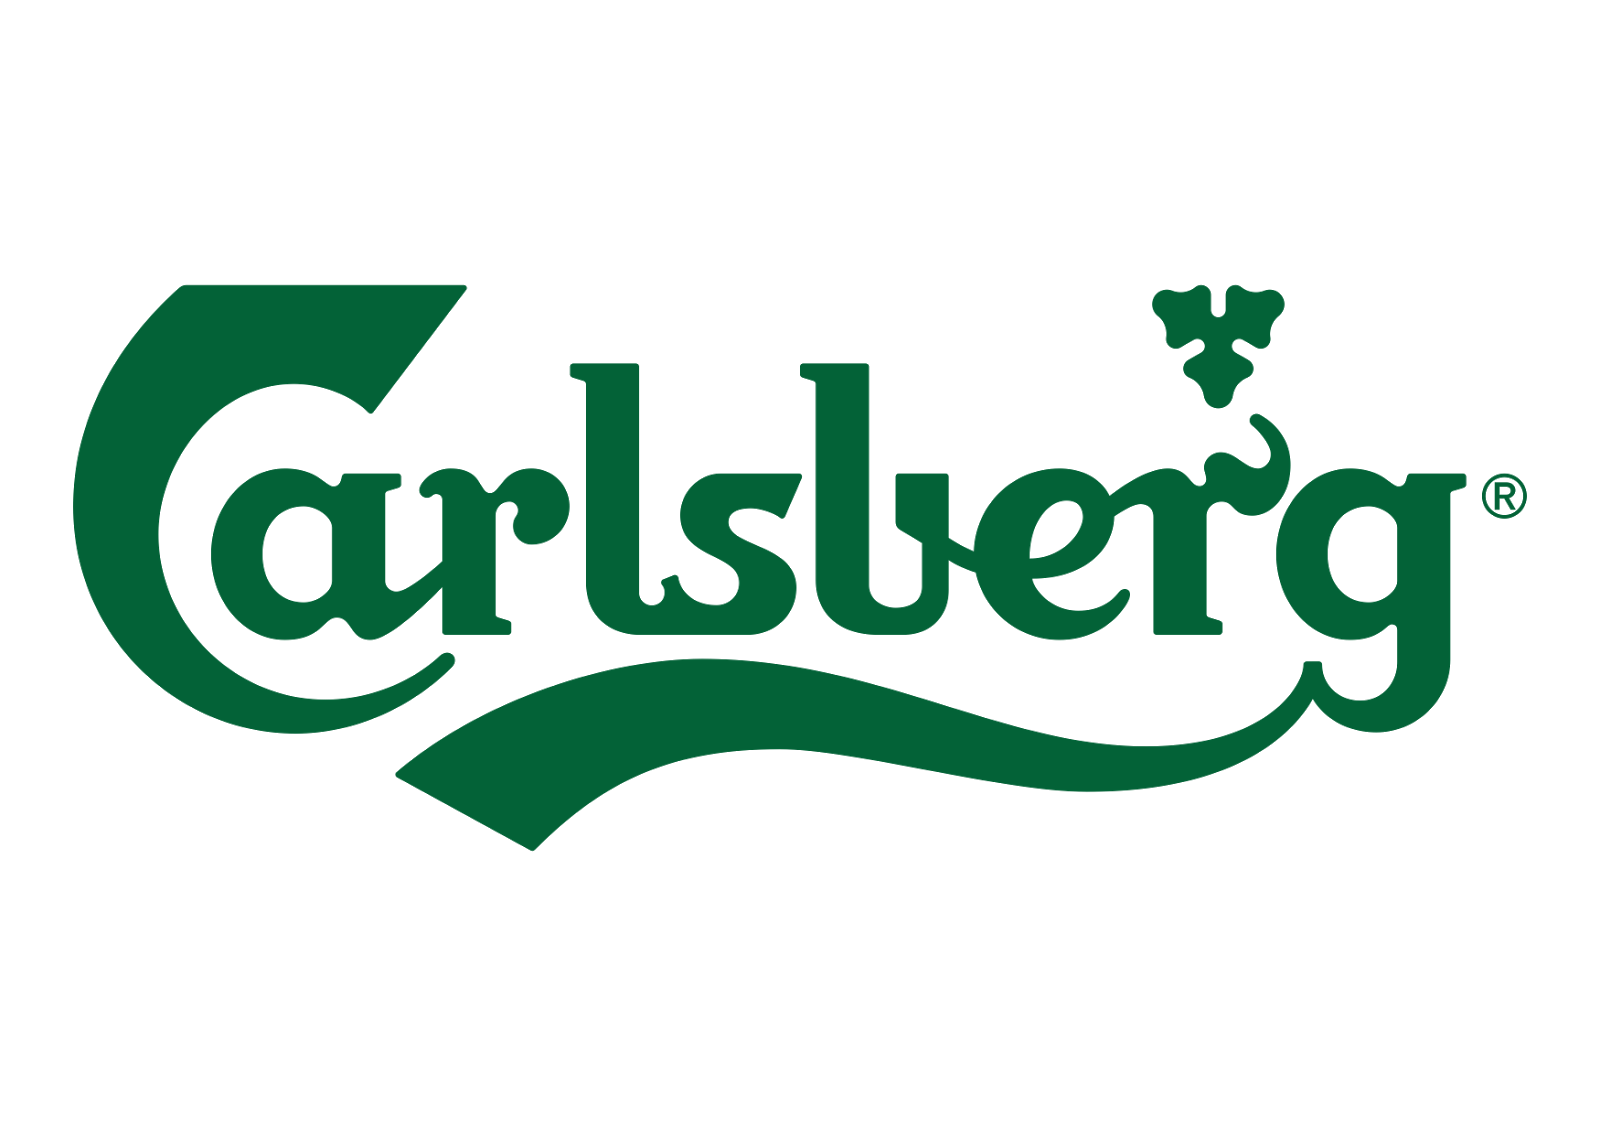 Carlsberg Logo Wallpaper